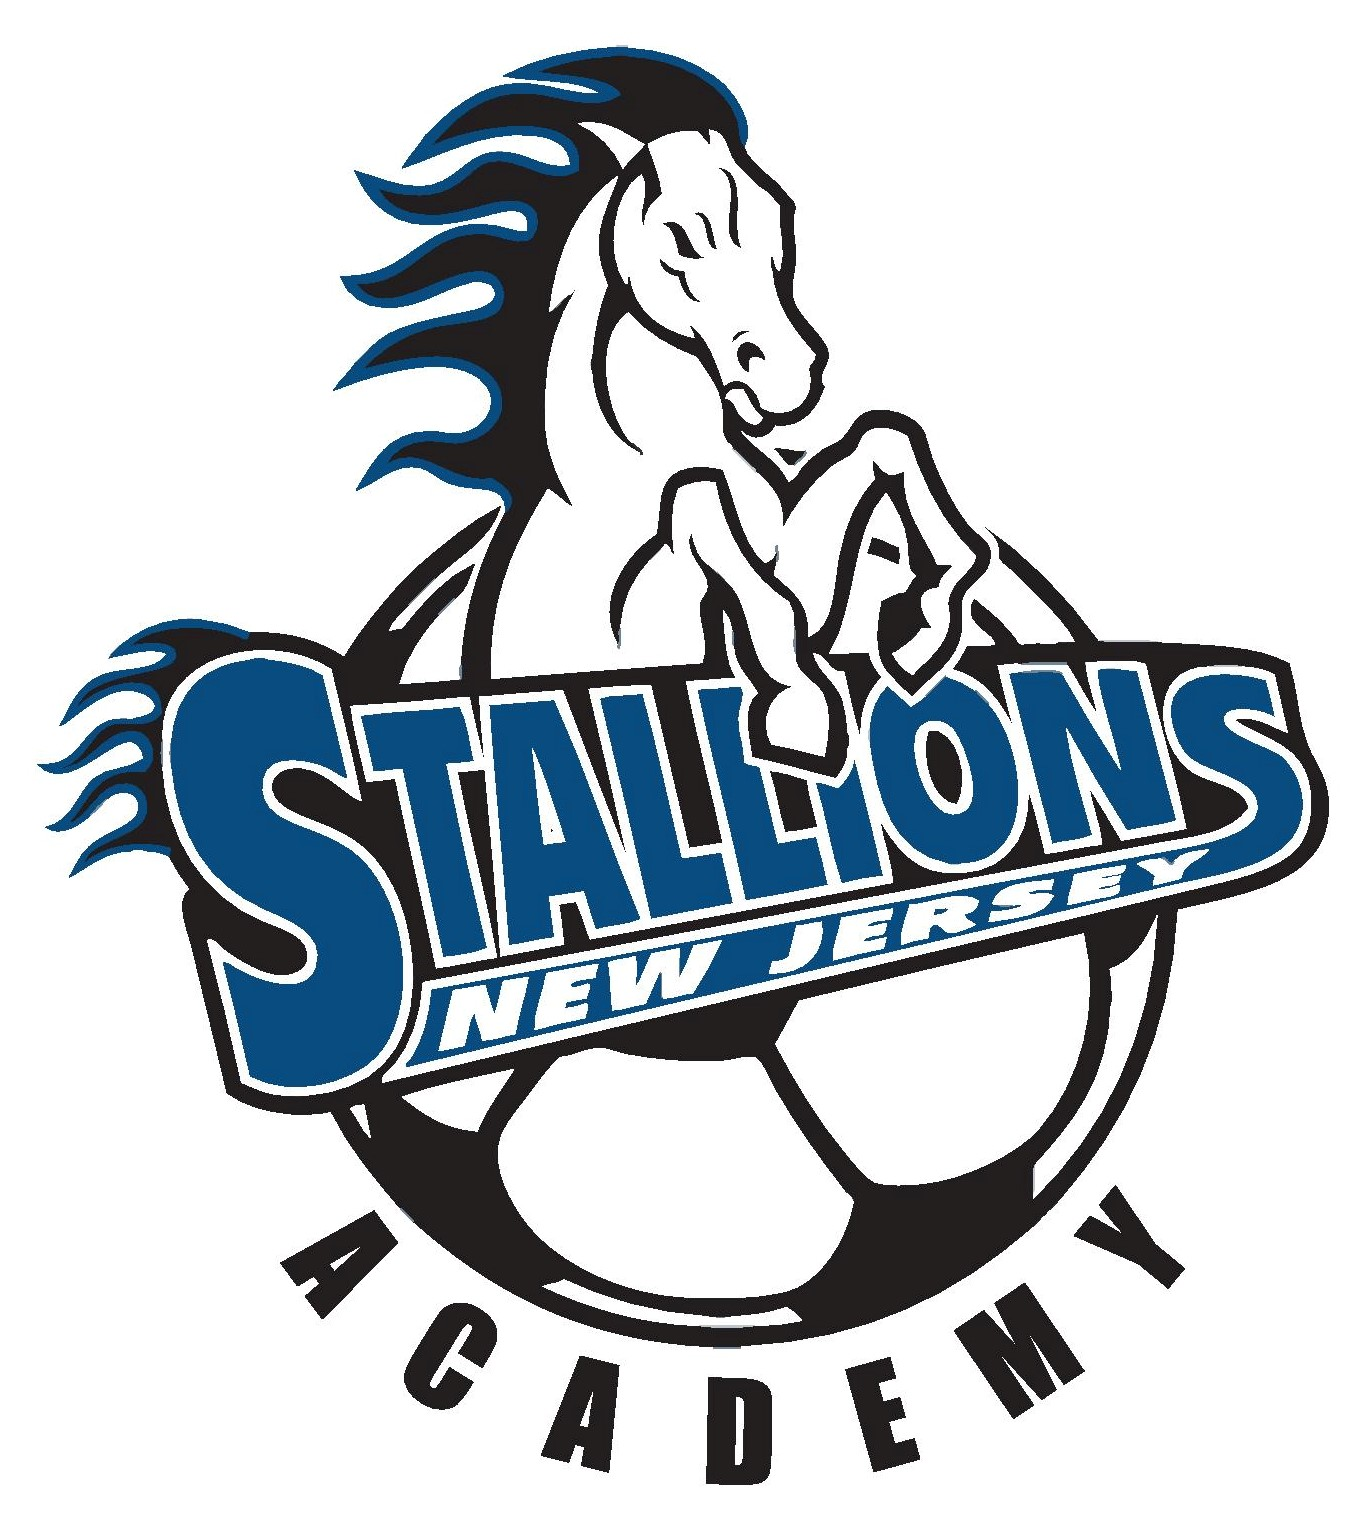 NJ Stallions 04 Sting